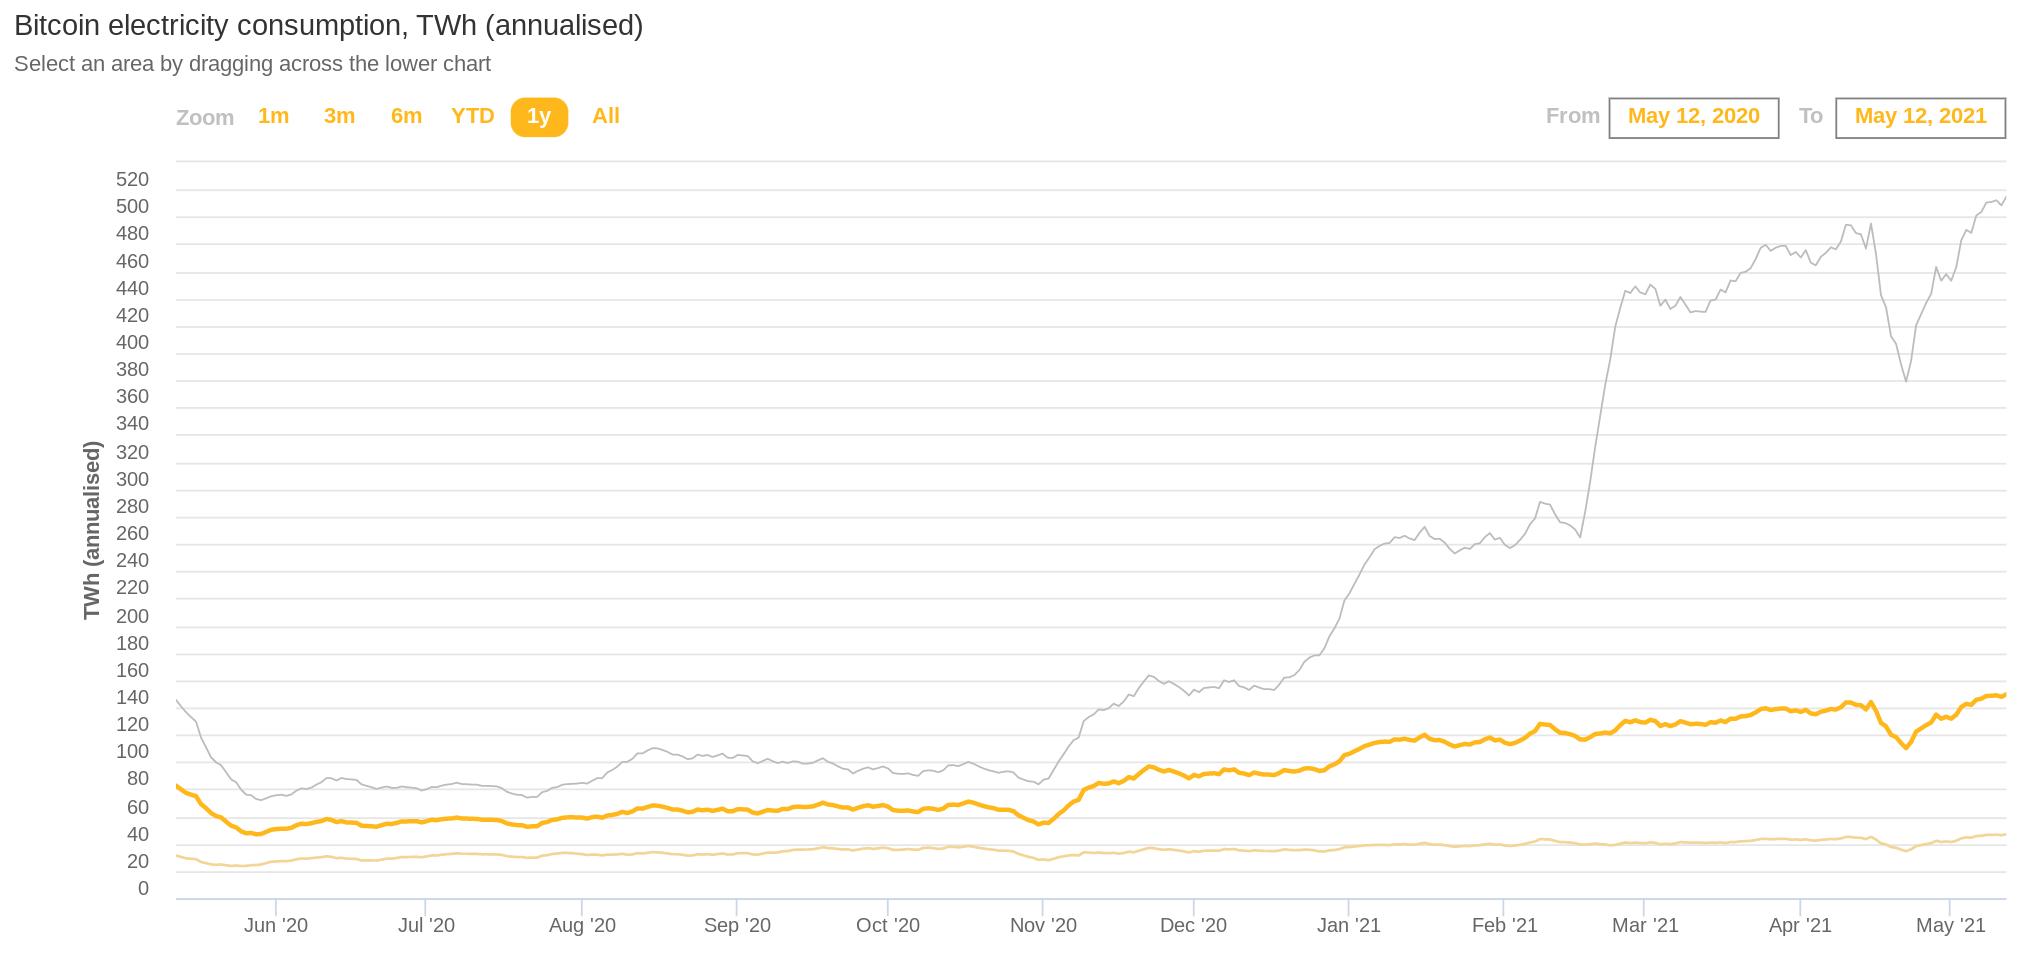 Analiza prețurilor XRP: 2 mai | Platon Blockchain